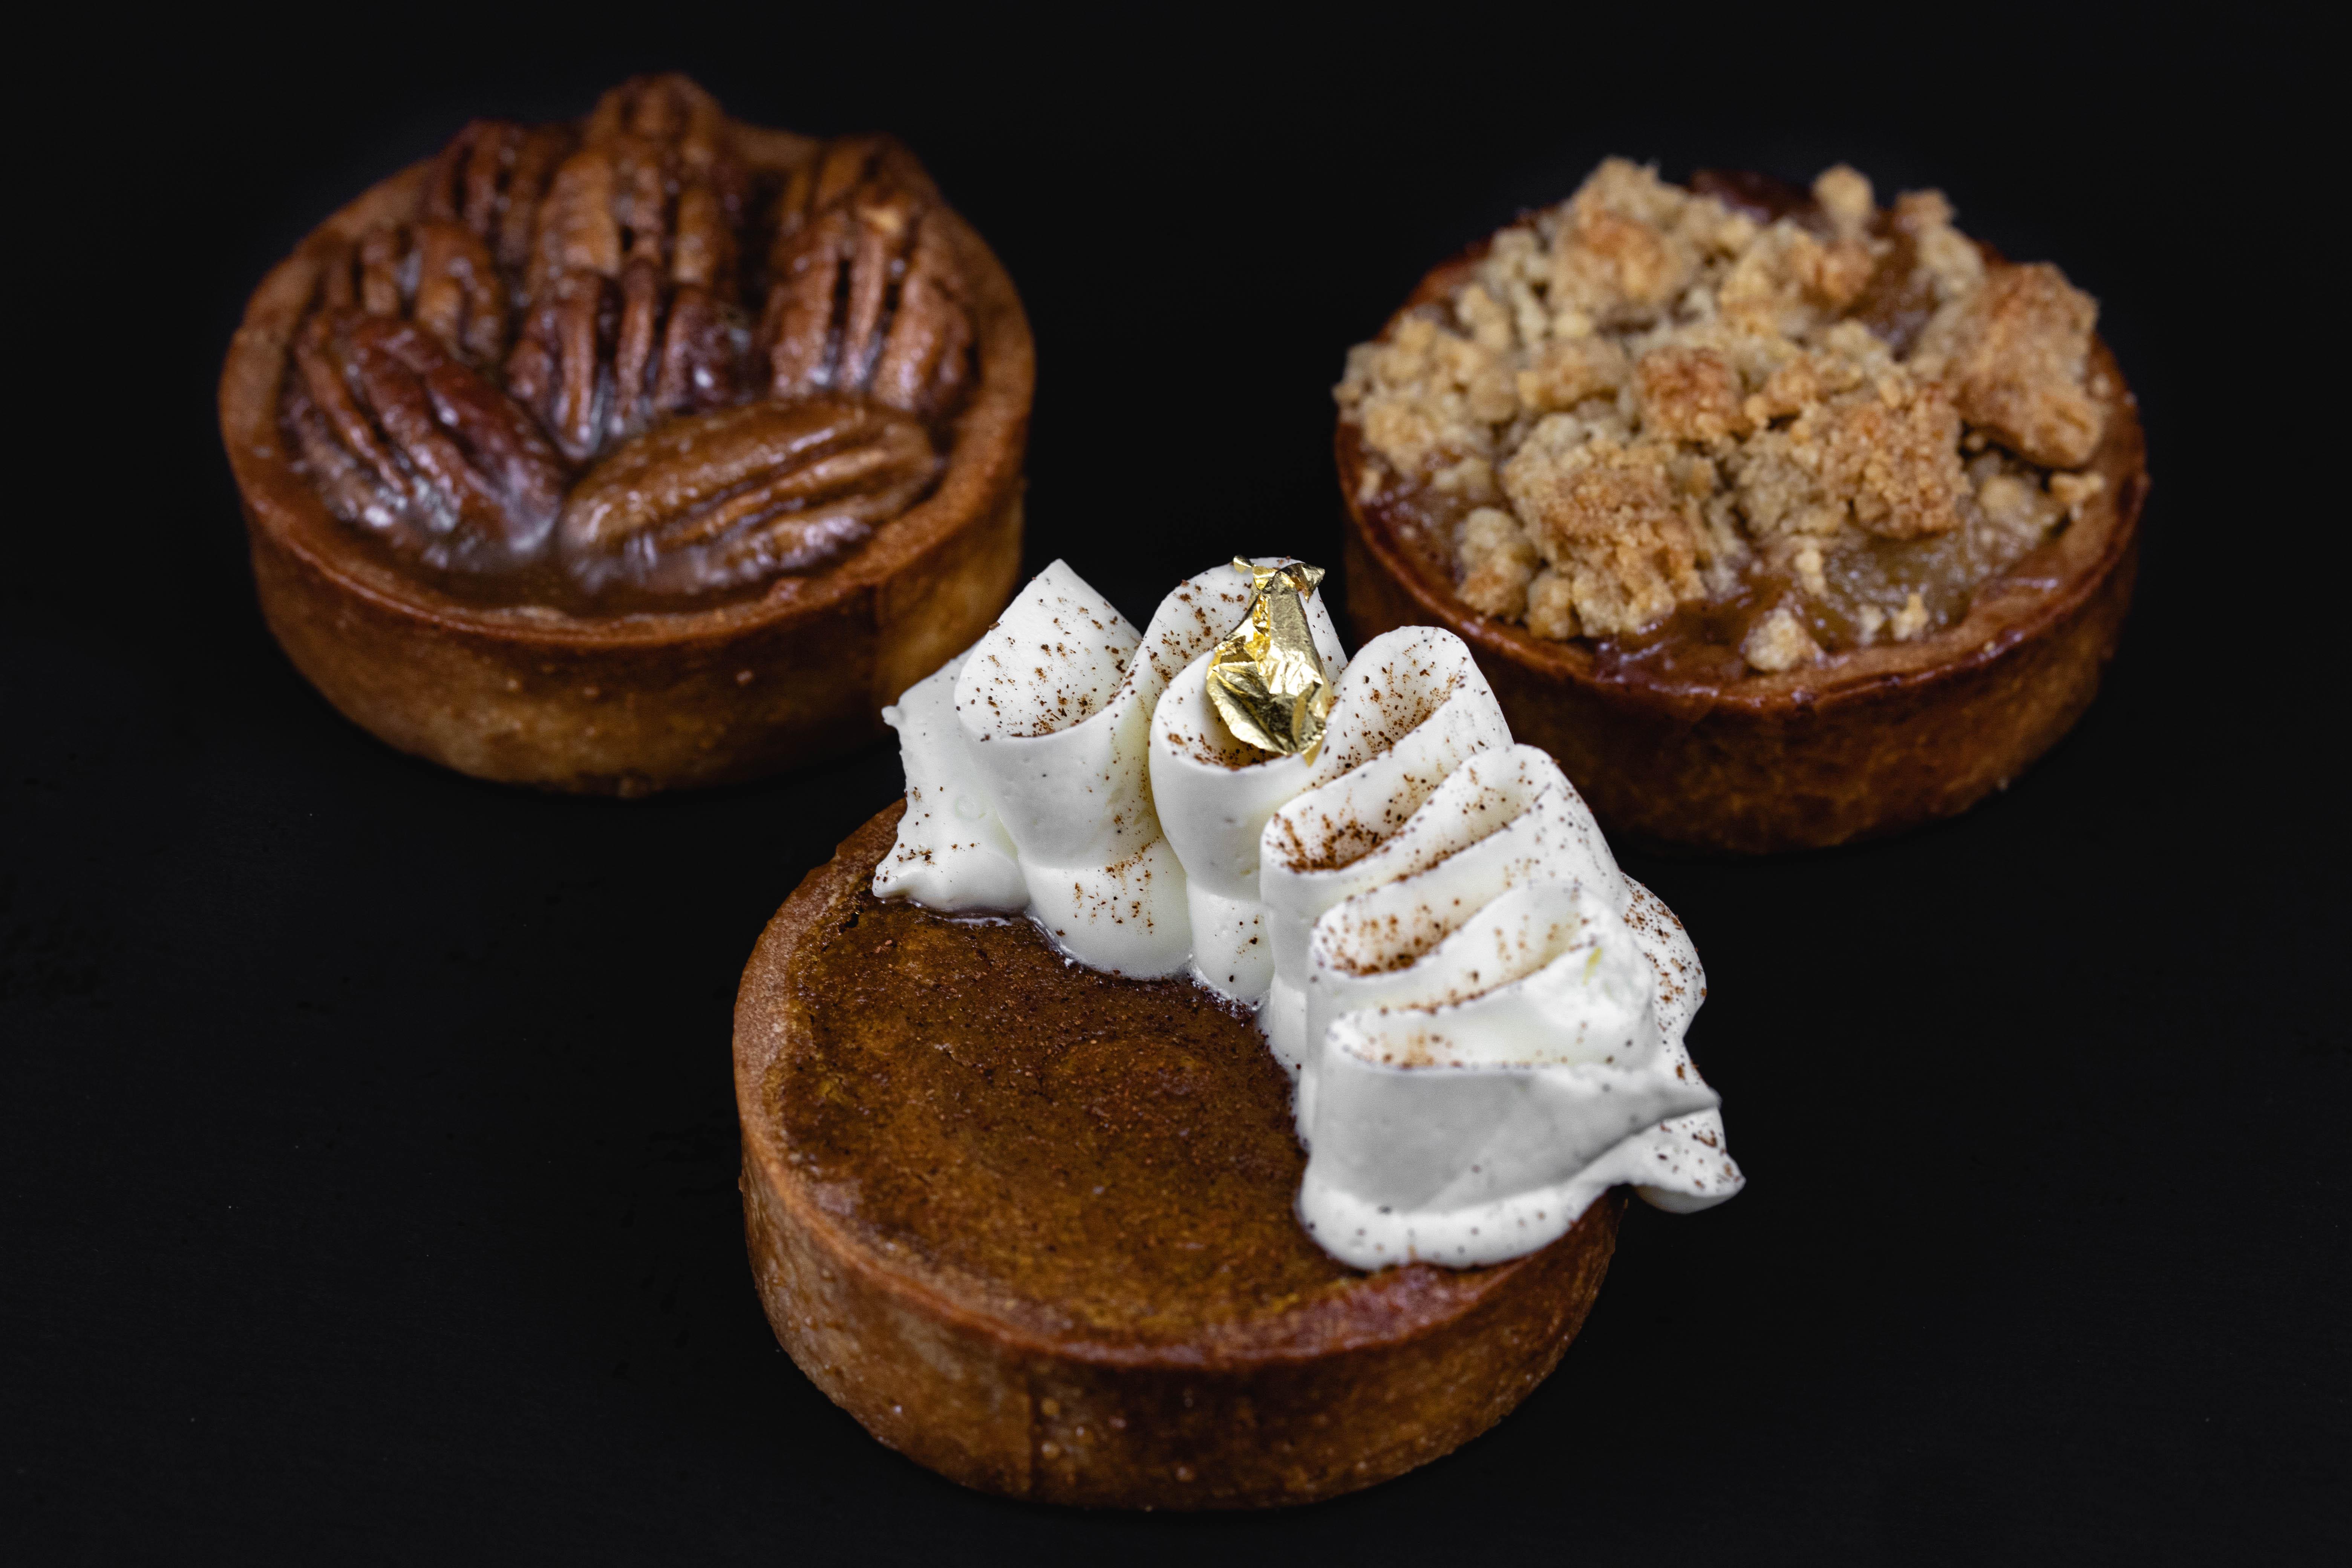 JL Patisserie fall collation – thanksgiving pies – pumpkin pie, pecan pies, apple pie available in gluten free